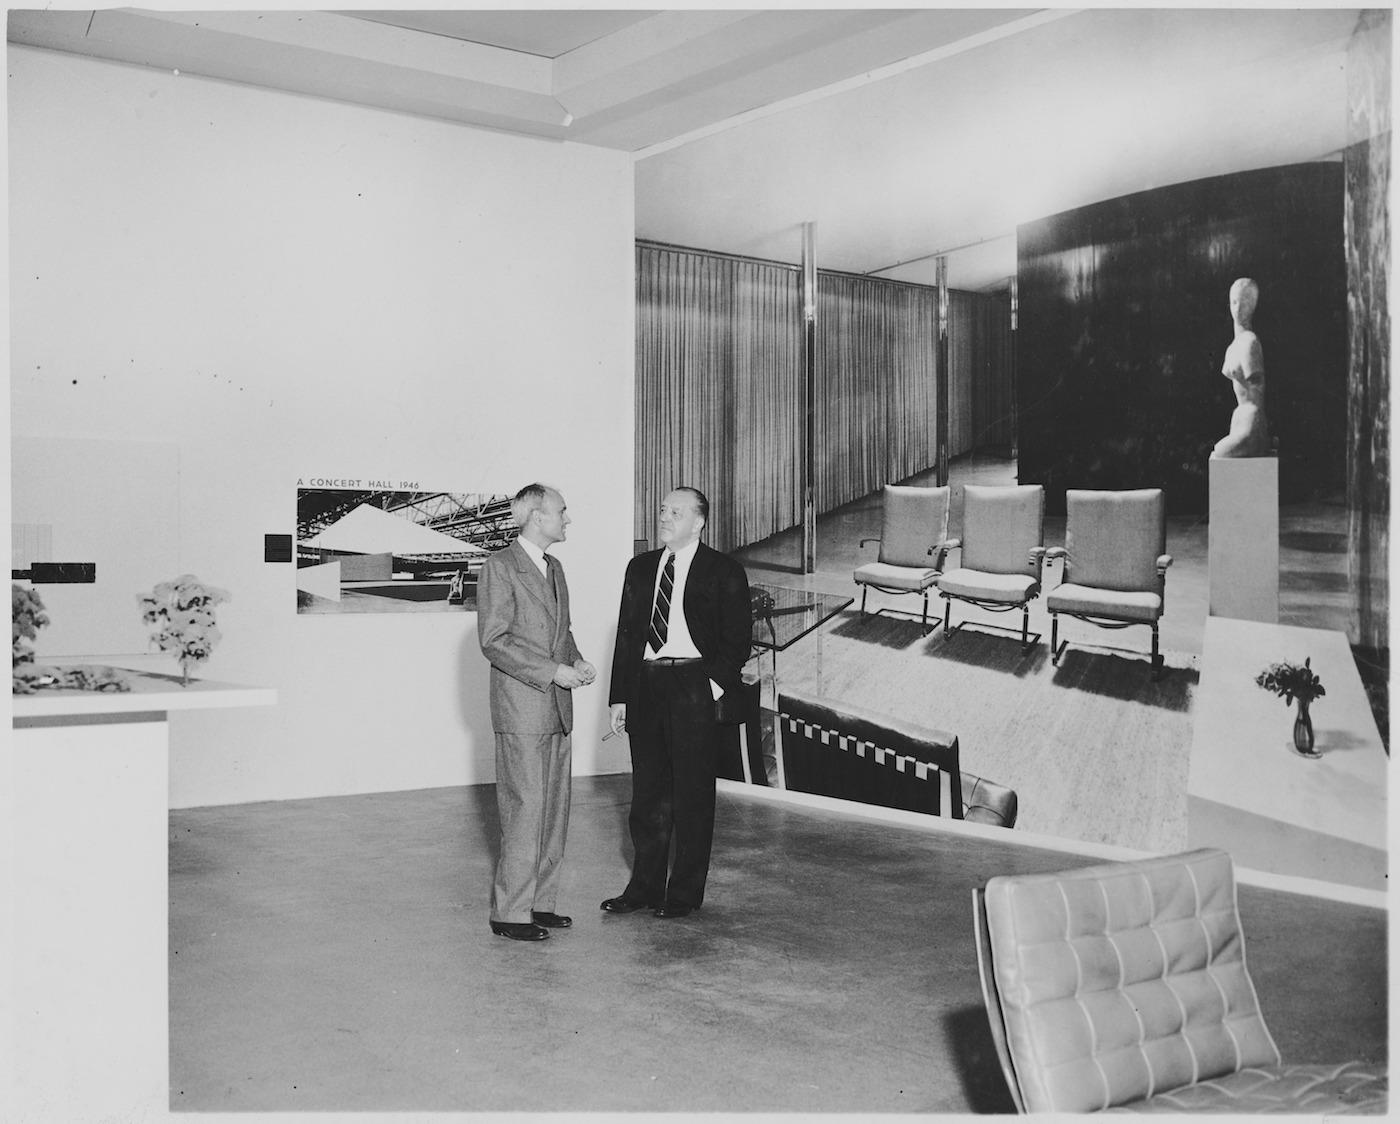 IN356 Mies van der Rohe, September 16, 1947 - January 25, 1948